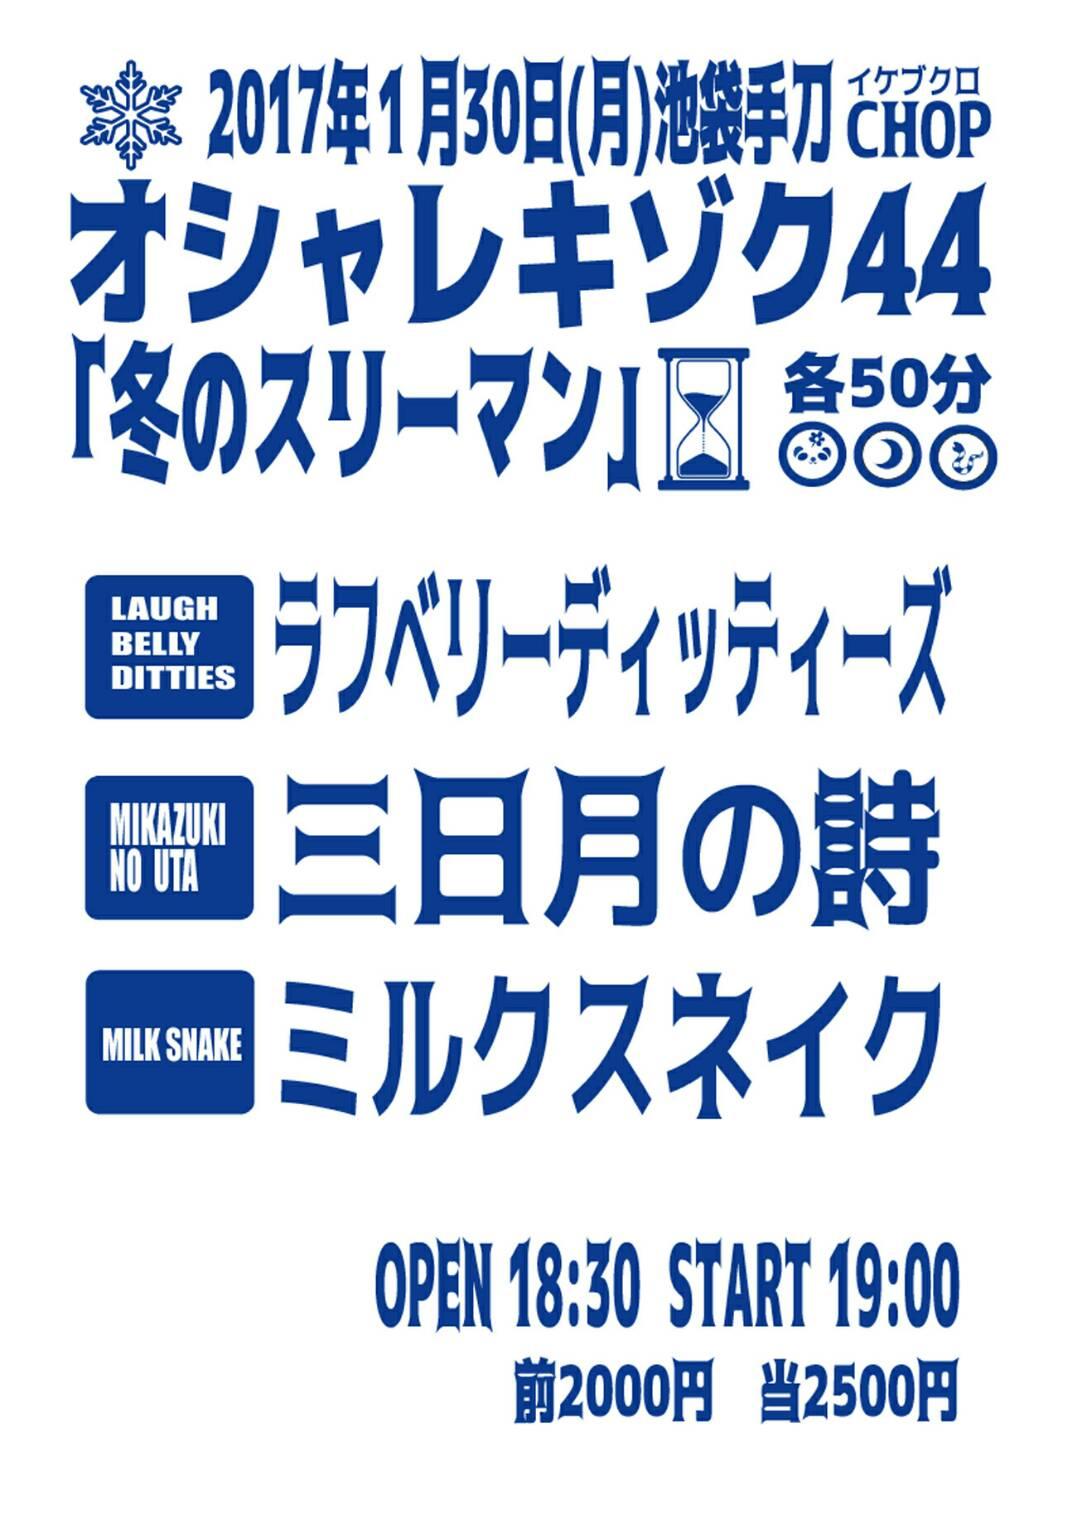 http://www.chop-tokyo.info/20170130f.jpg